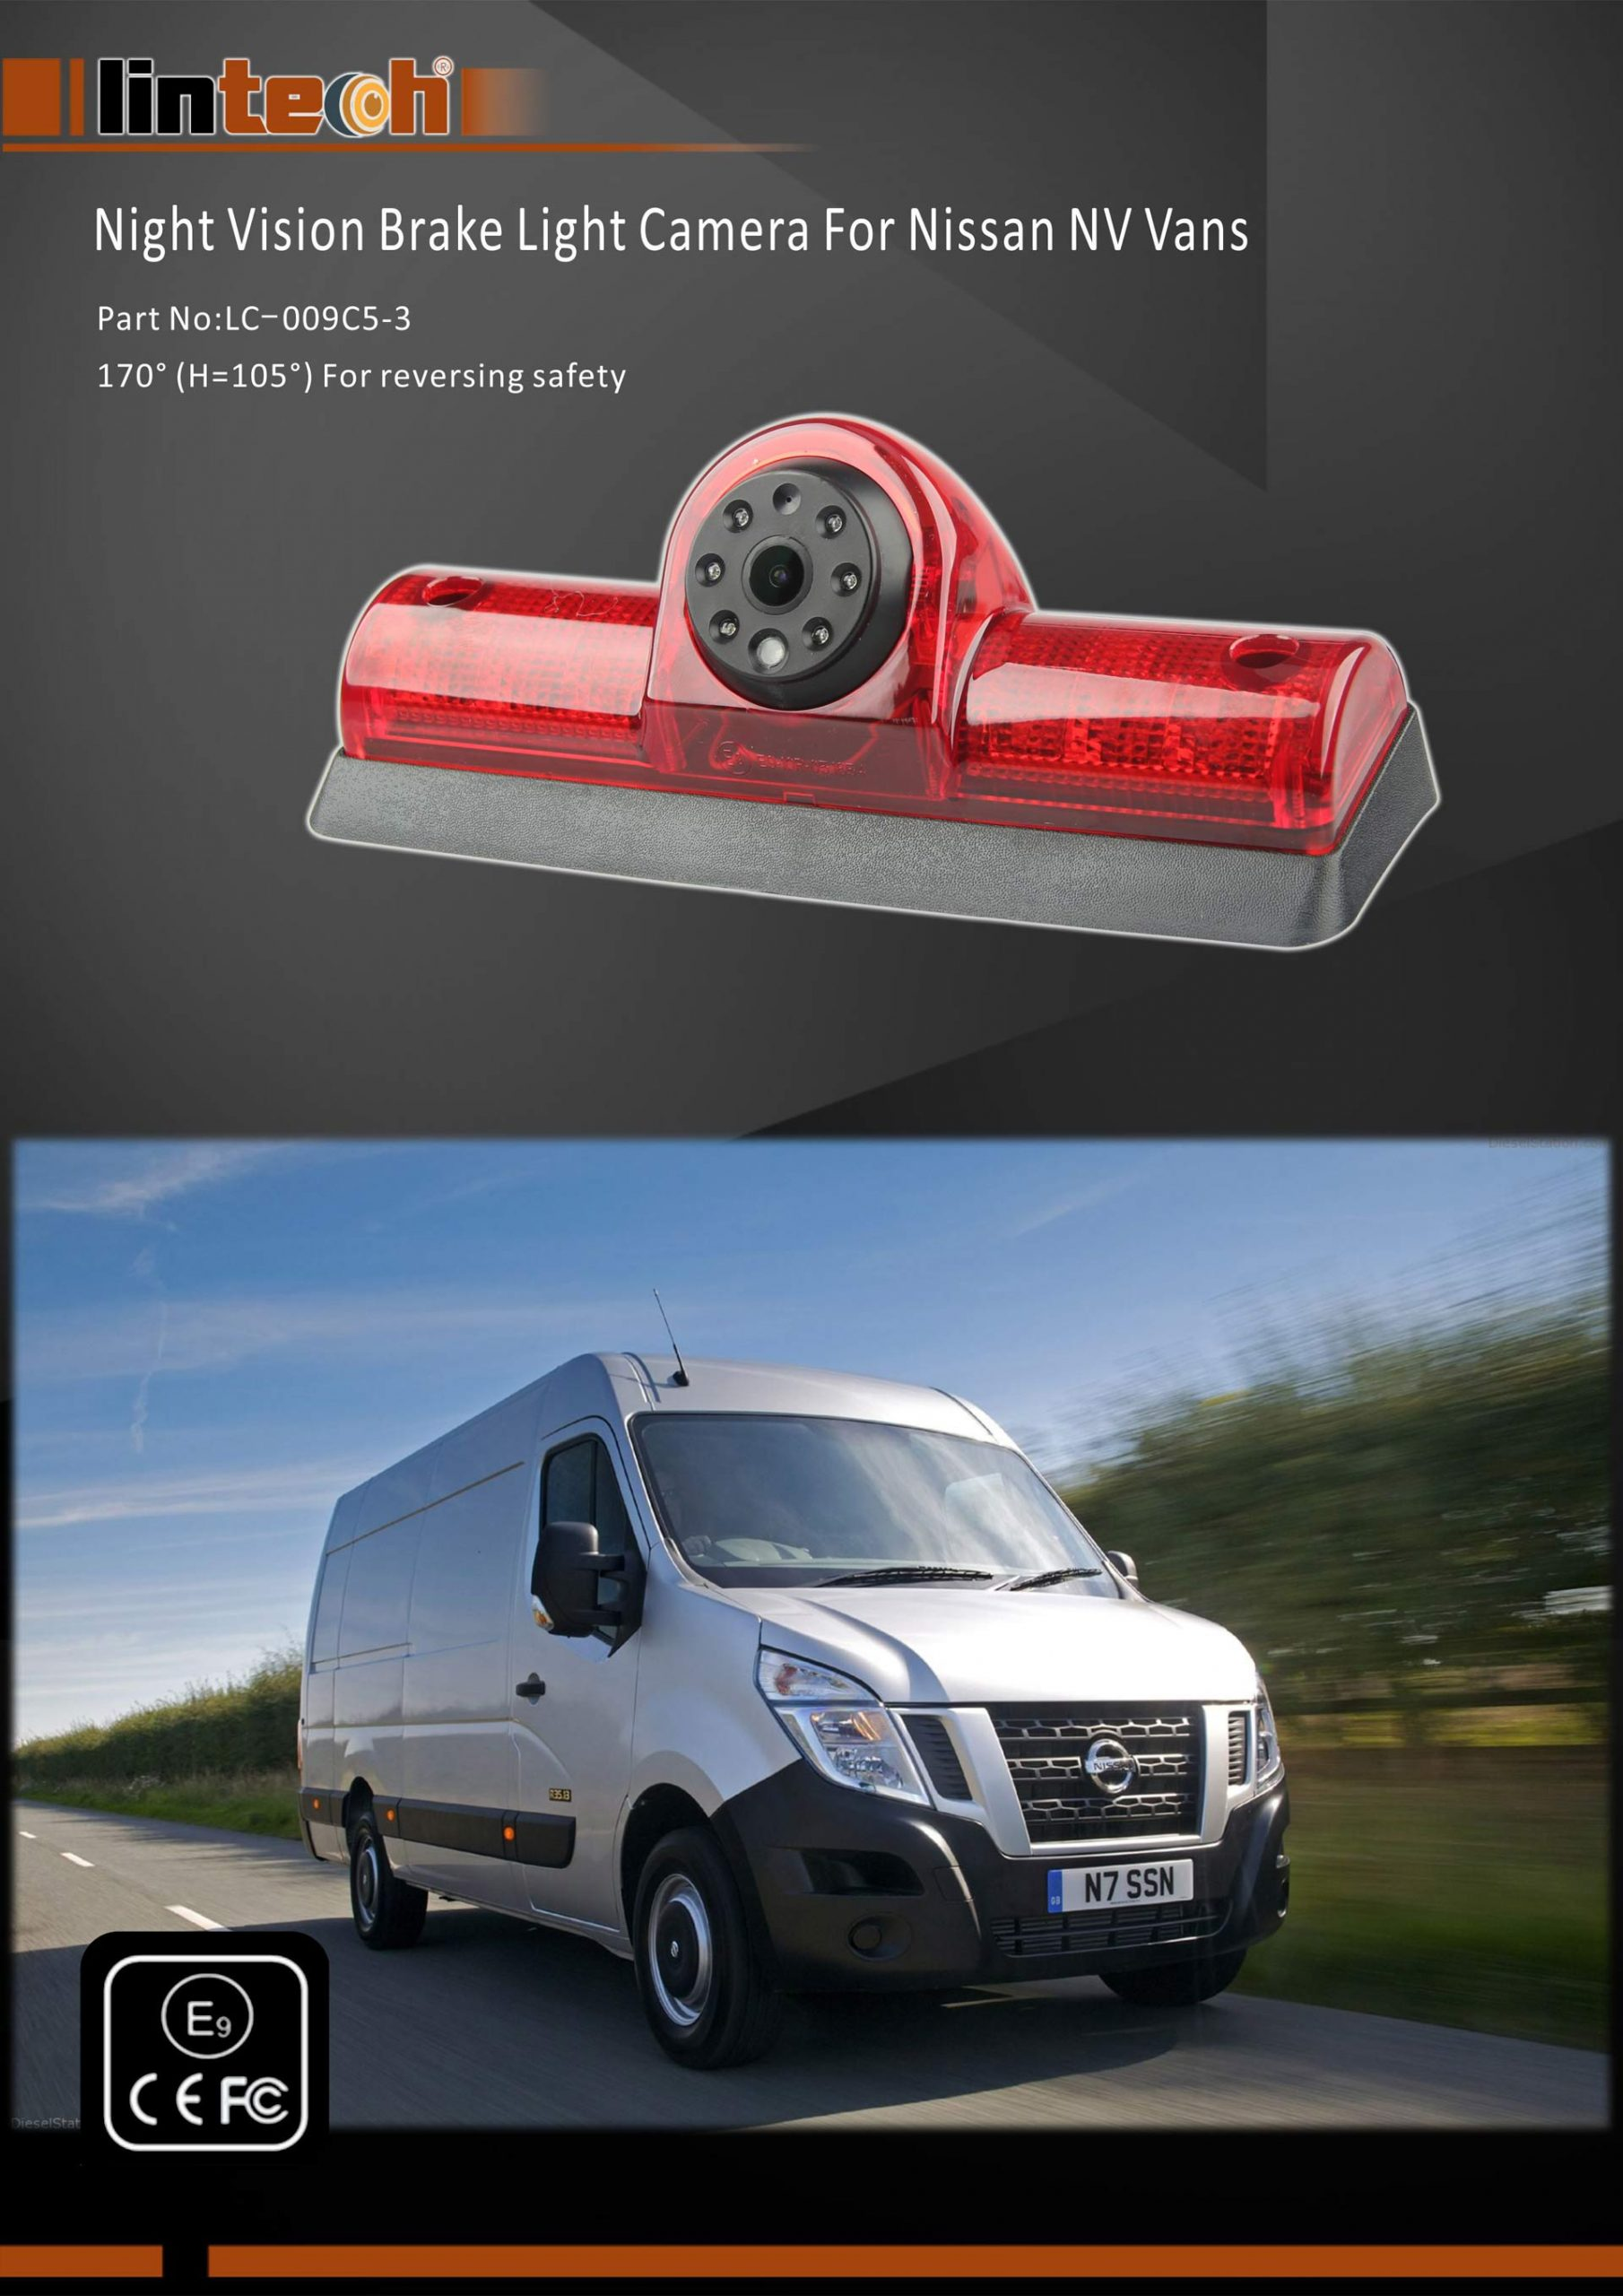 1. Nissan NV Vans Backup Camera